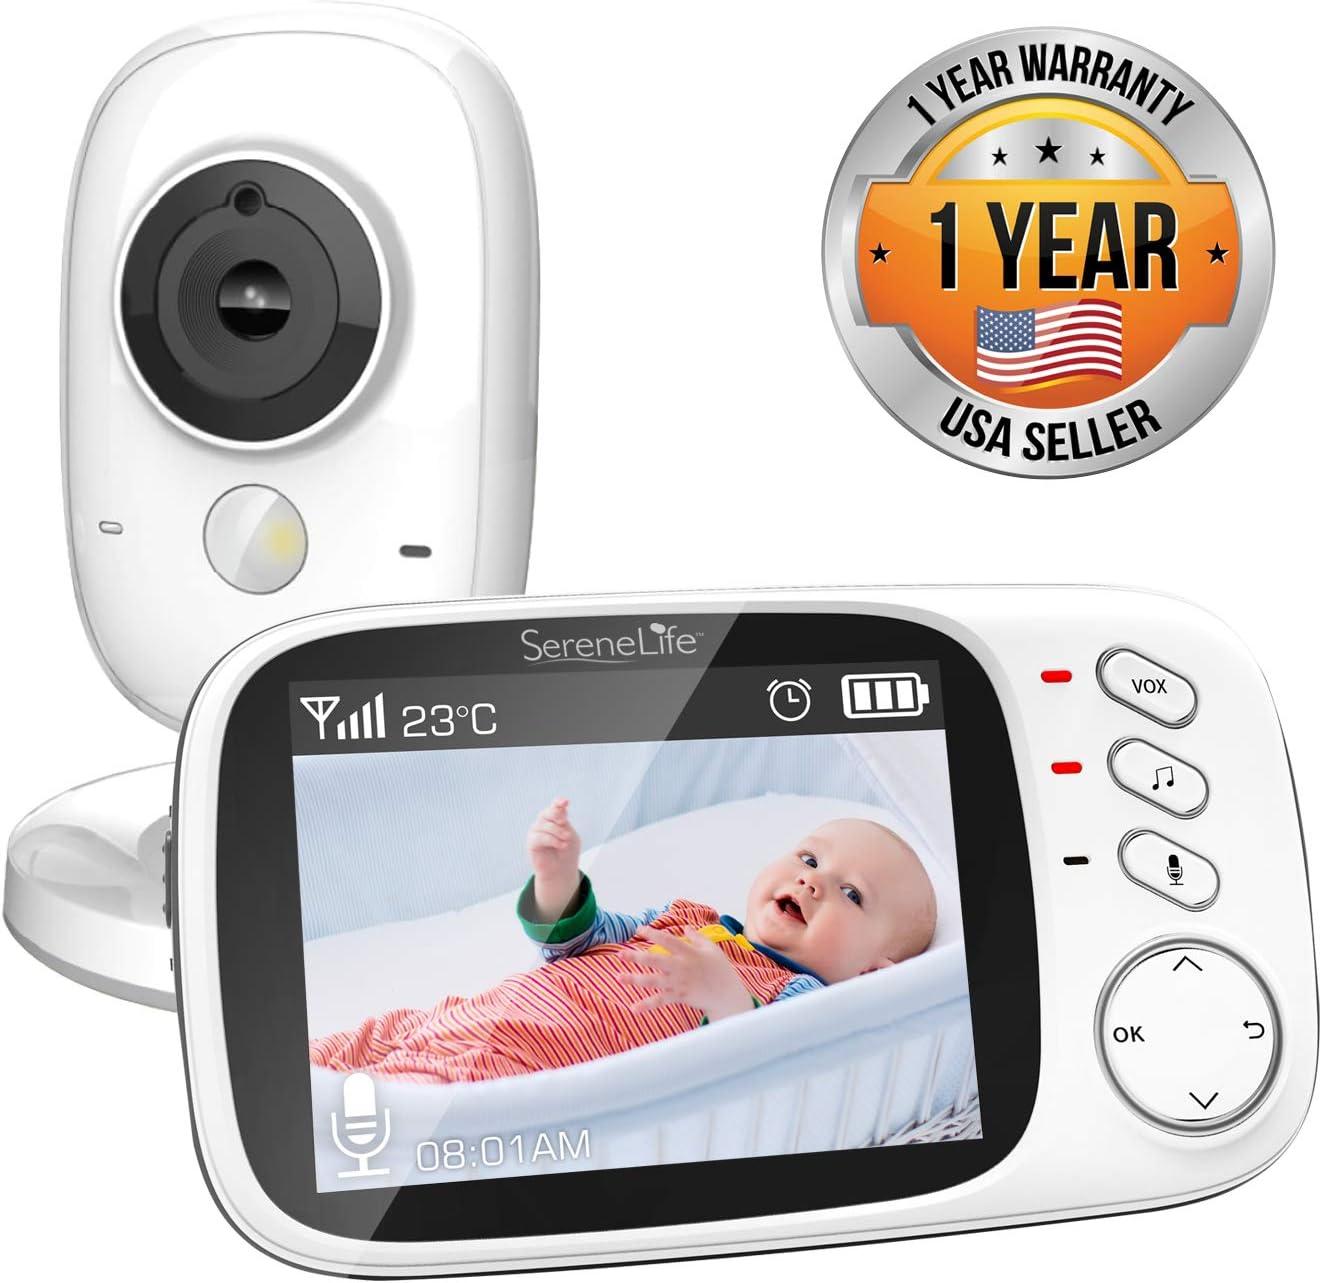 Video Baby Monitor Long Range Upgraded 850' Wireless Range, Night Vision, Temperature Monitoring